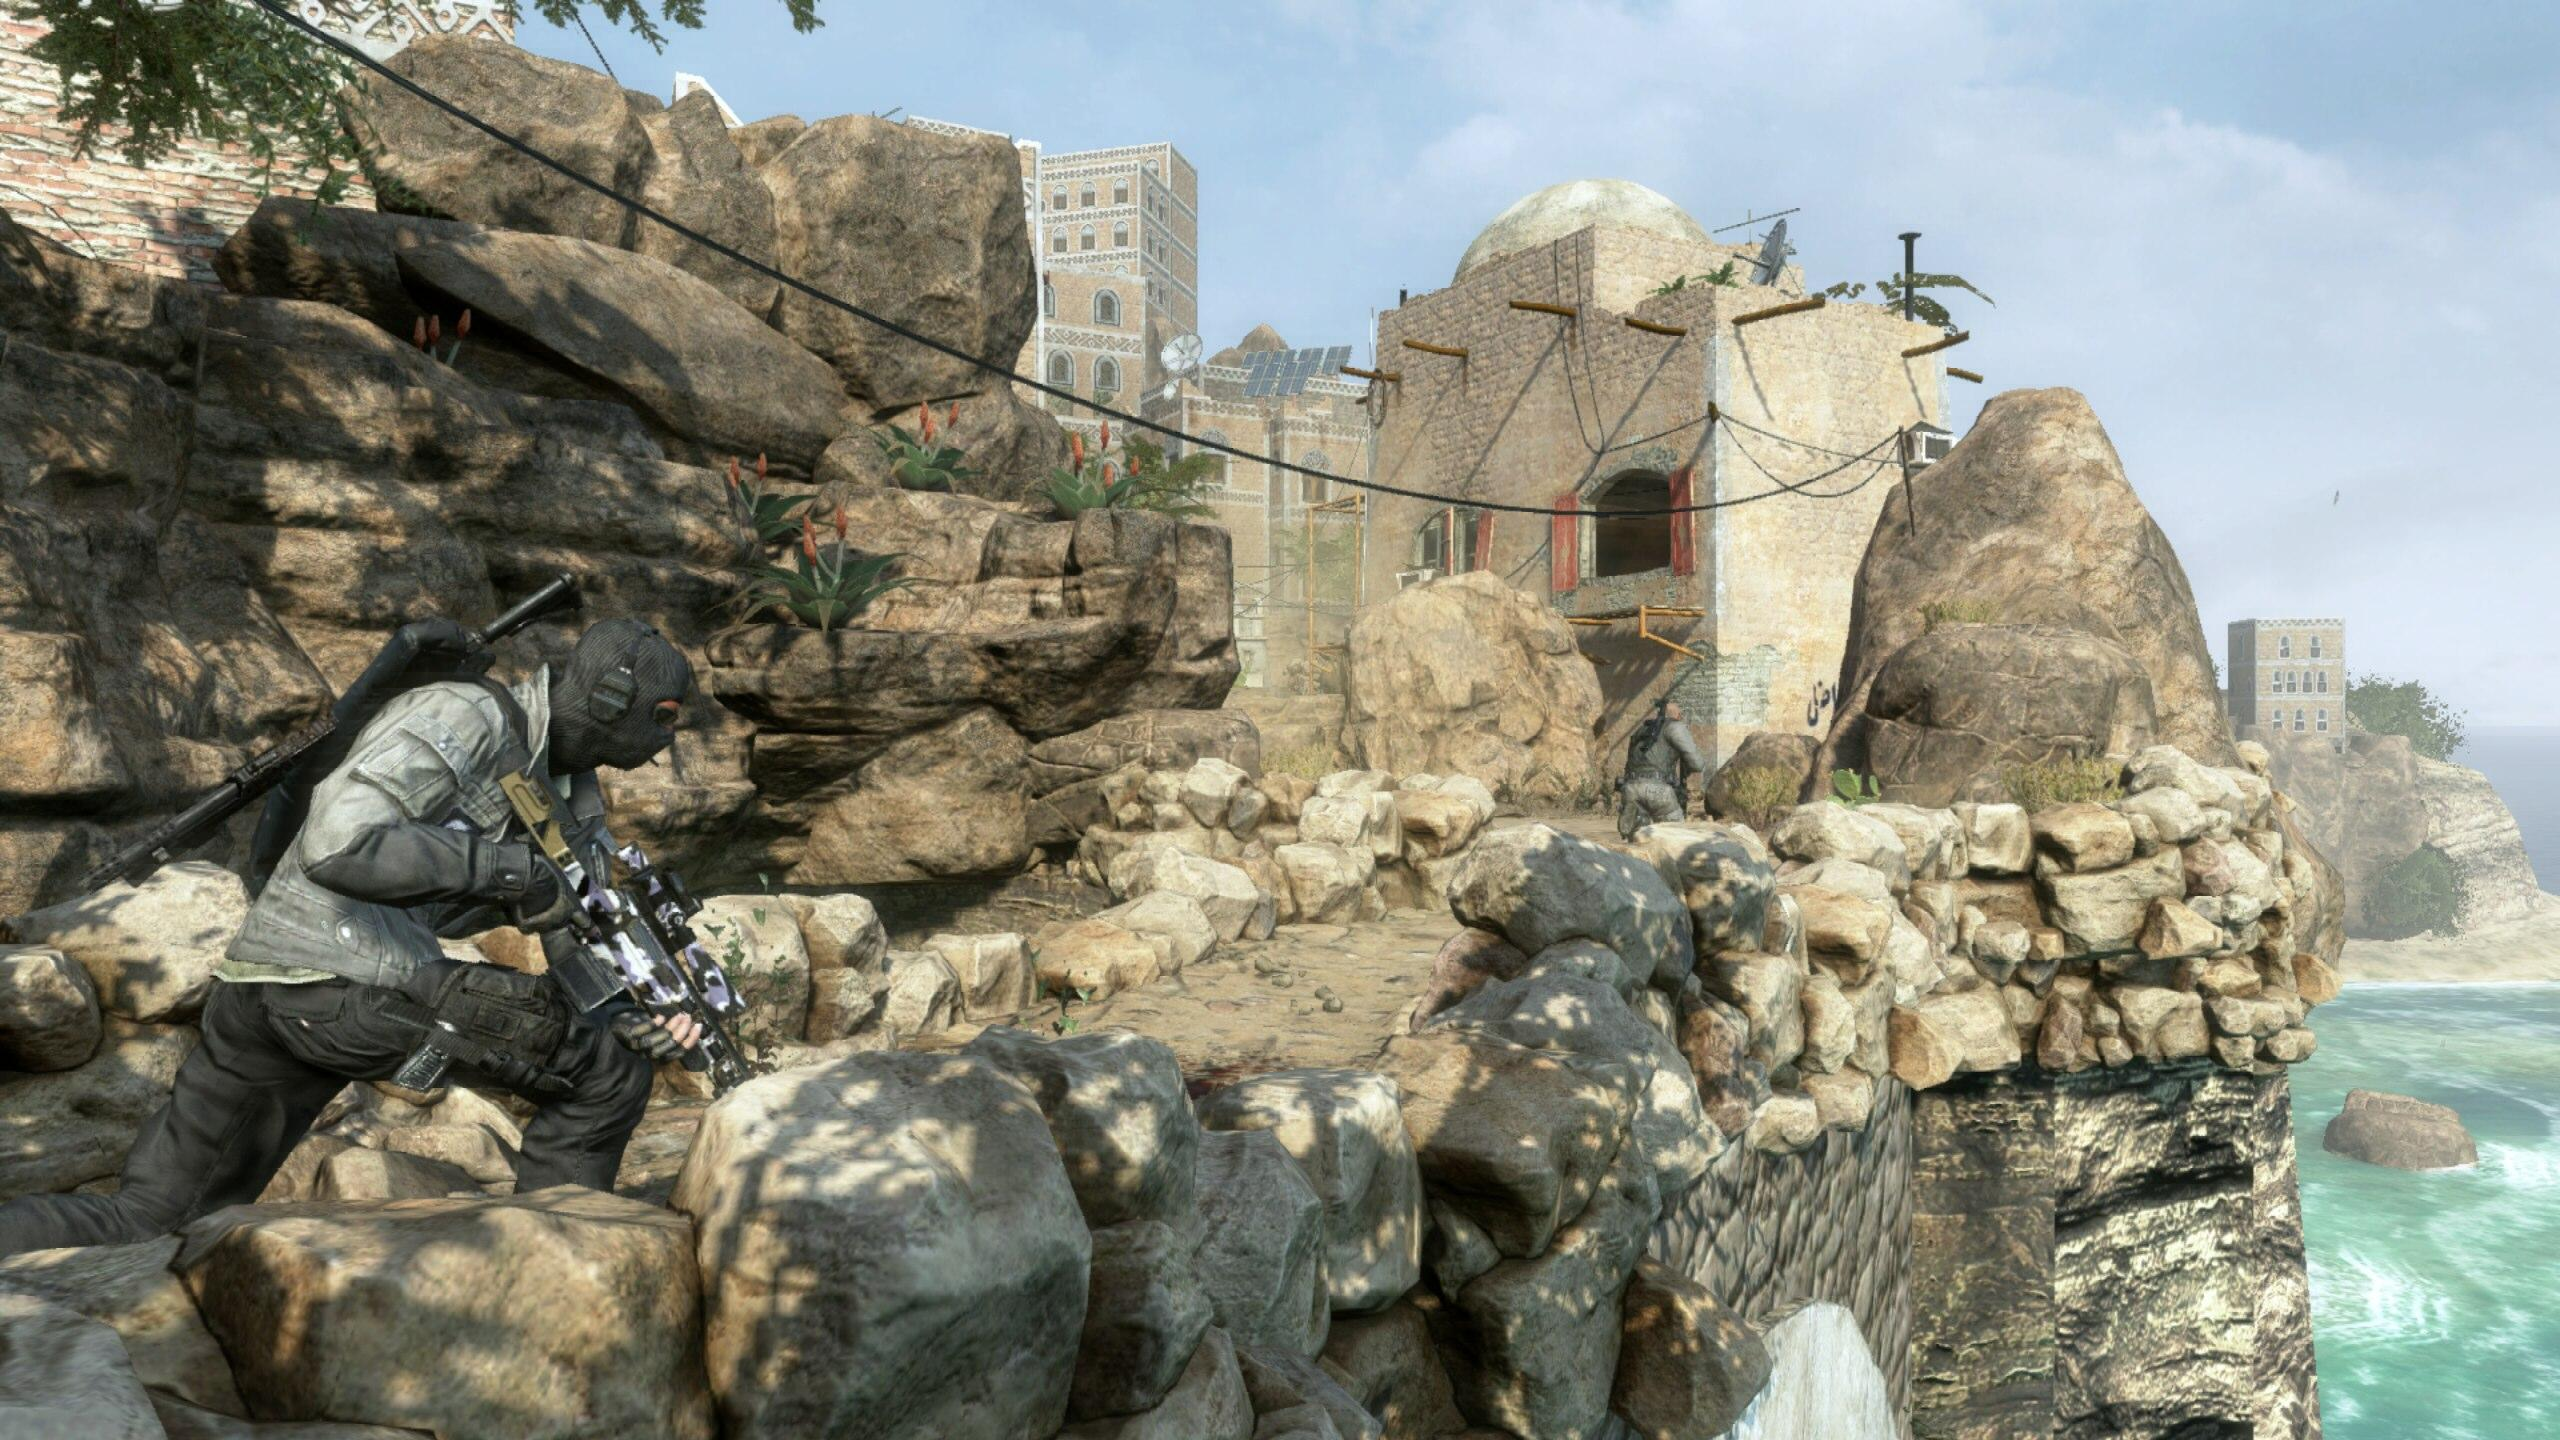 Black Ops Ii Wallpaper Bo2 Yemen Avalon Ryuzaki57 S Oblivion